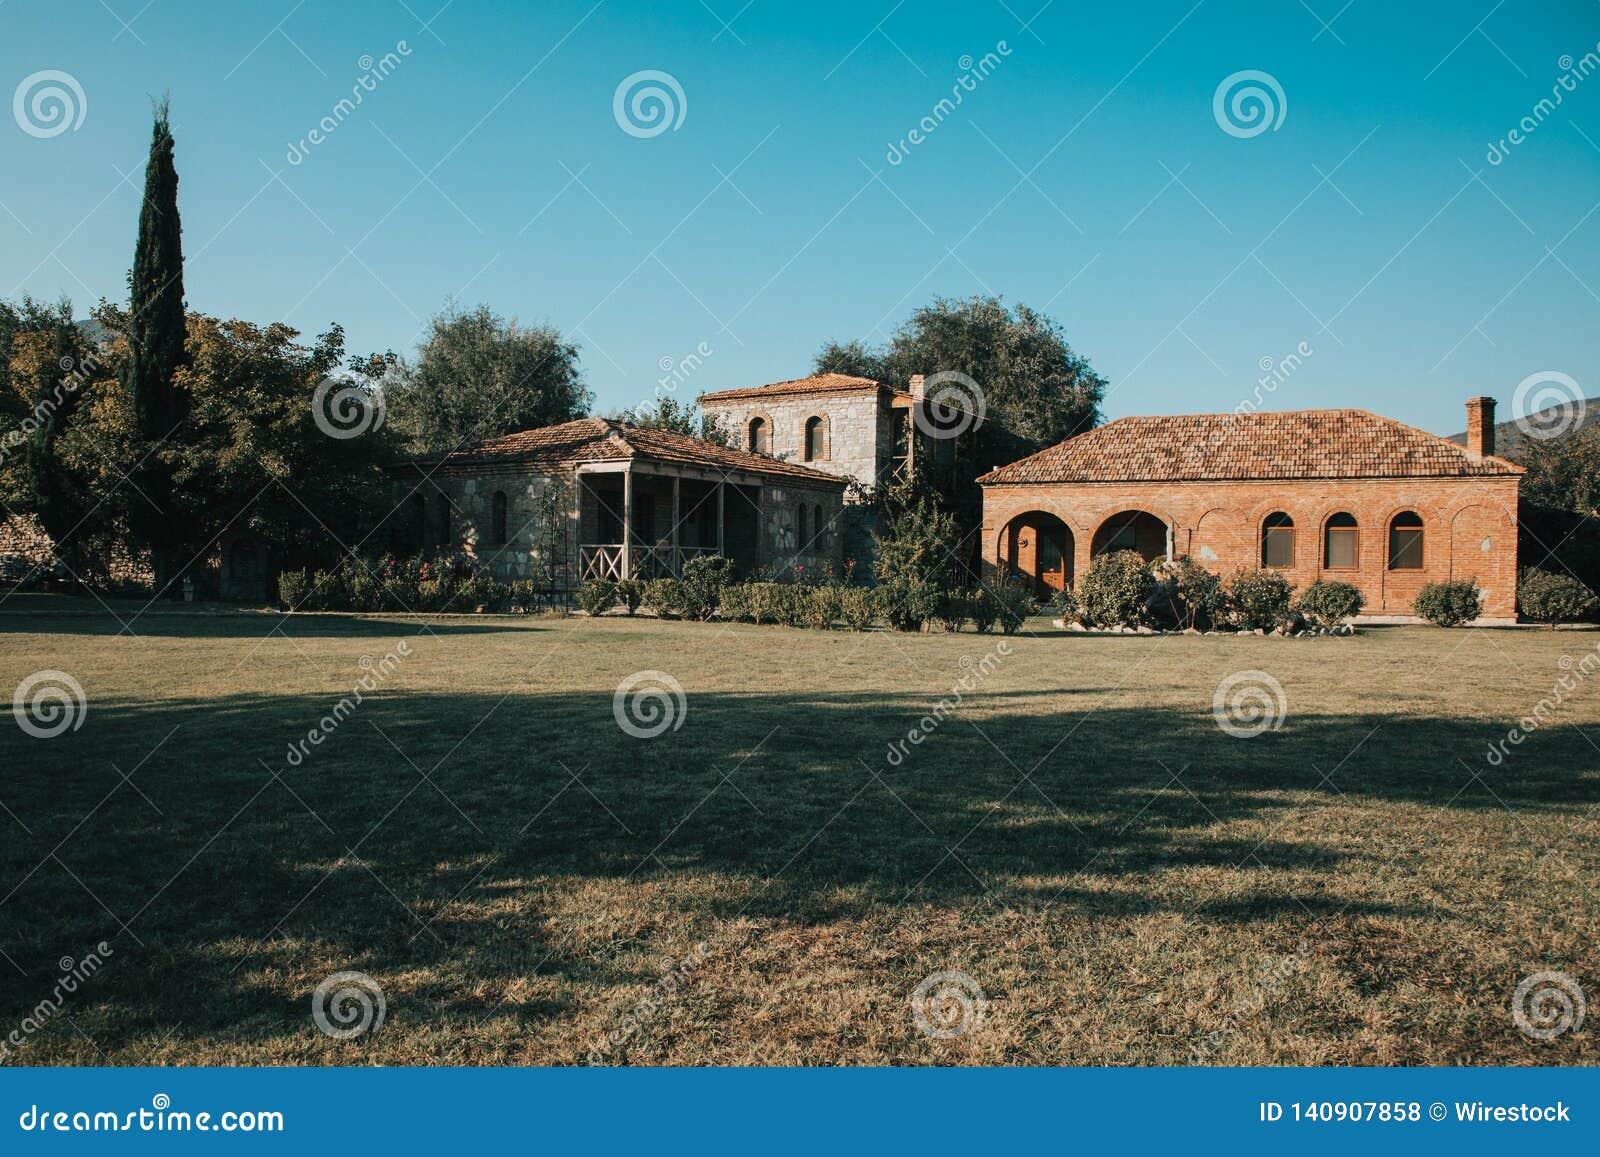 Photo of a villa